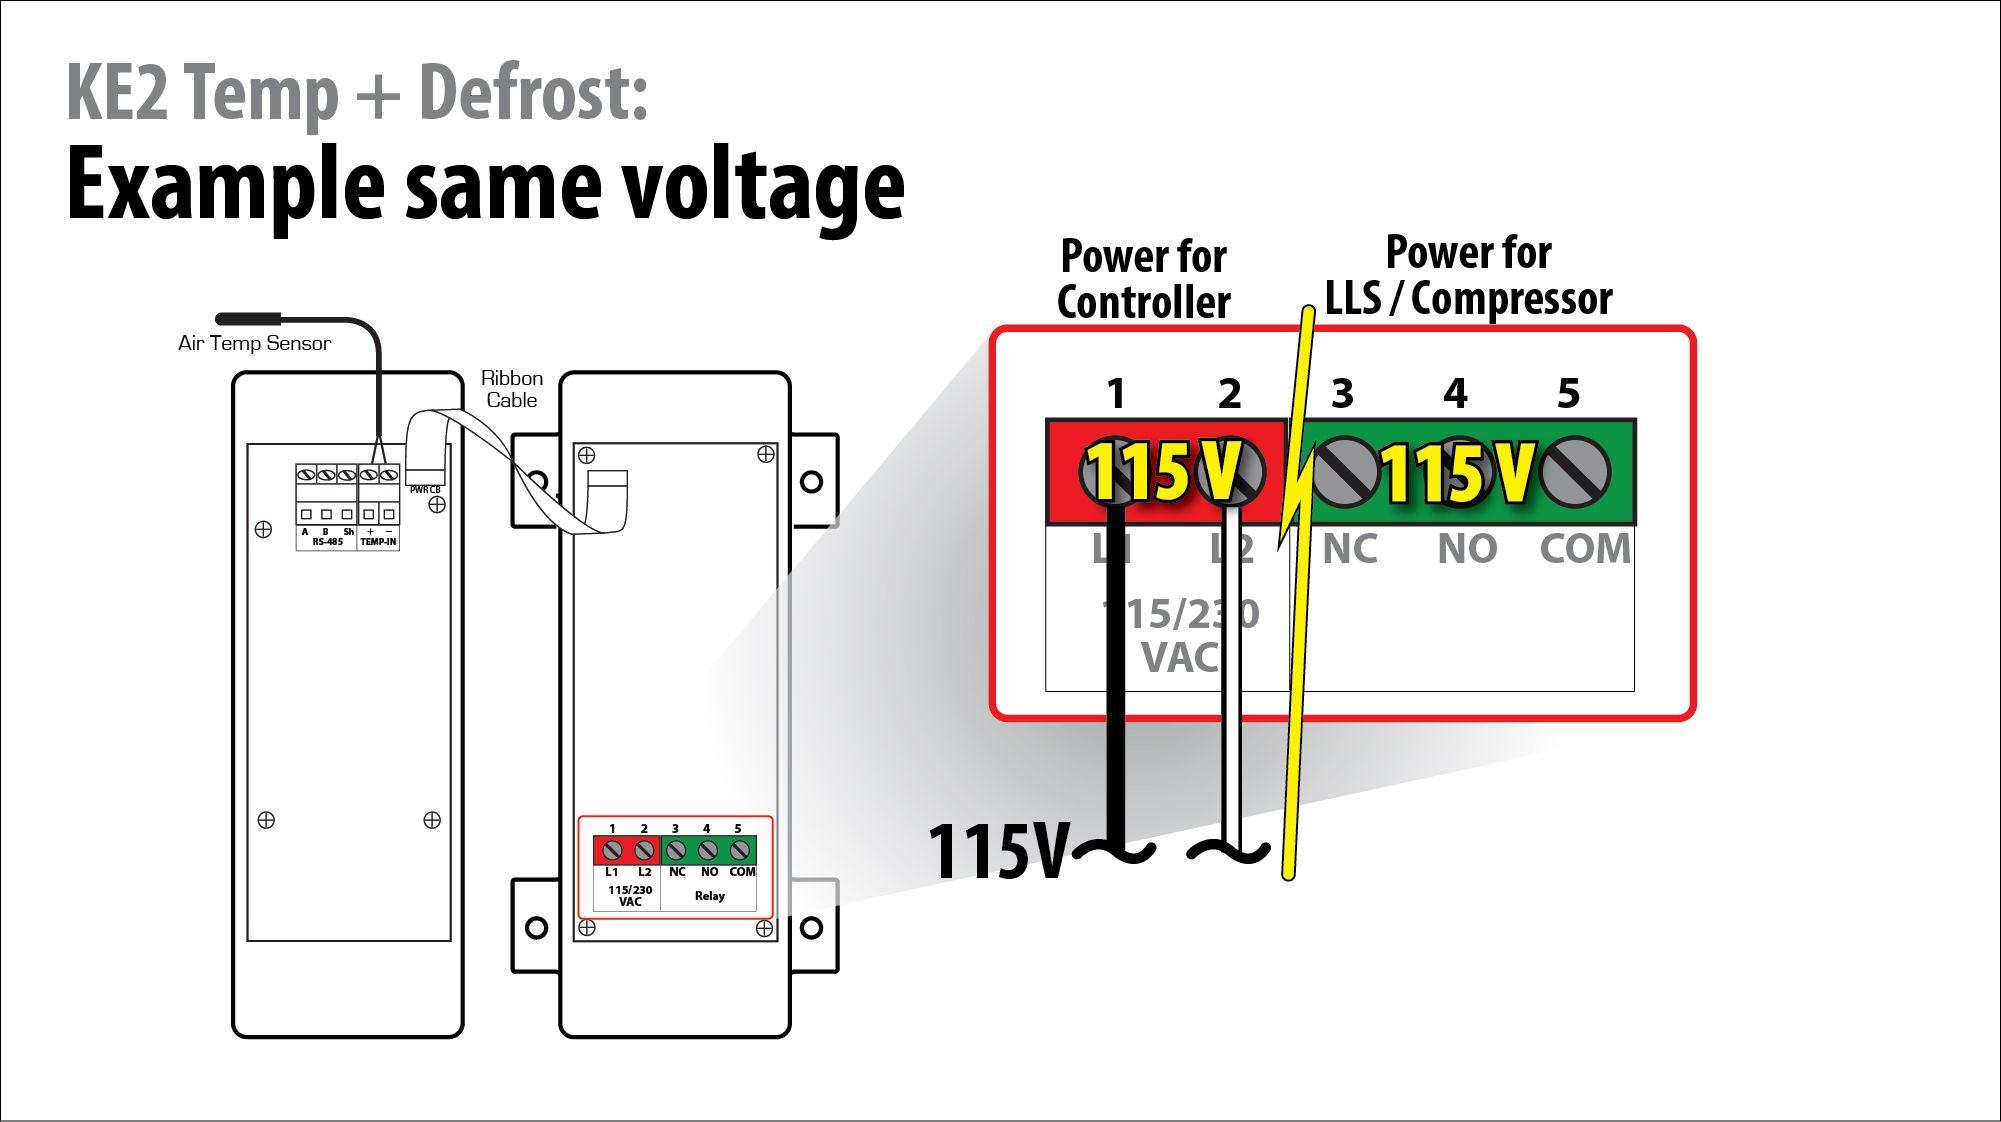 video 091 how to wire the ke2 temp + defrostl - ke2therm walk-in freezers